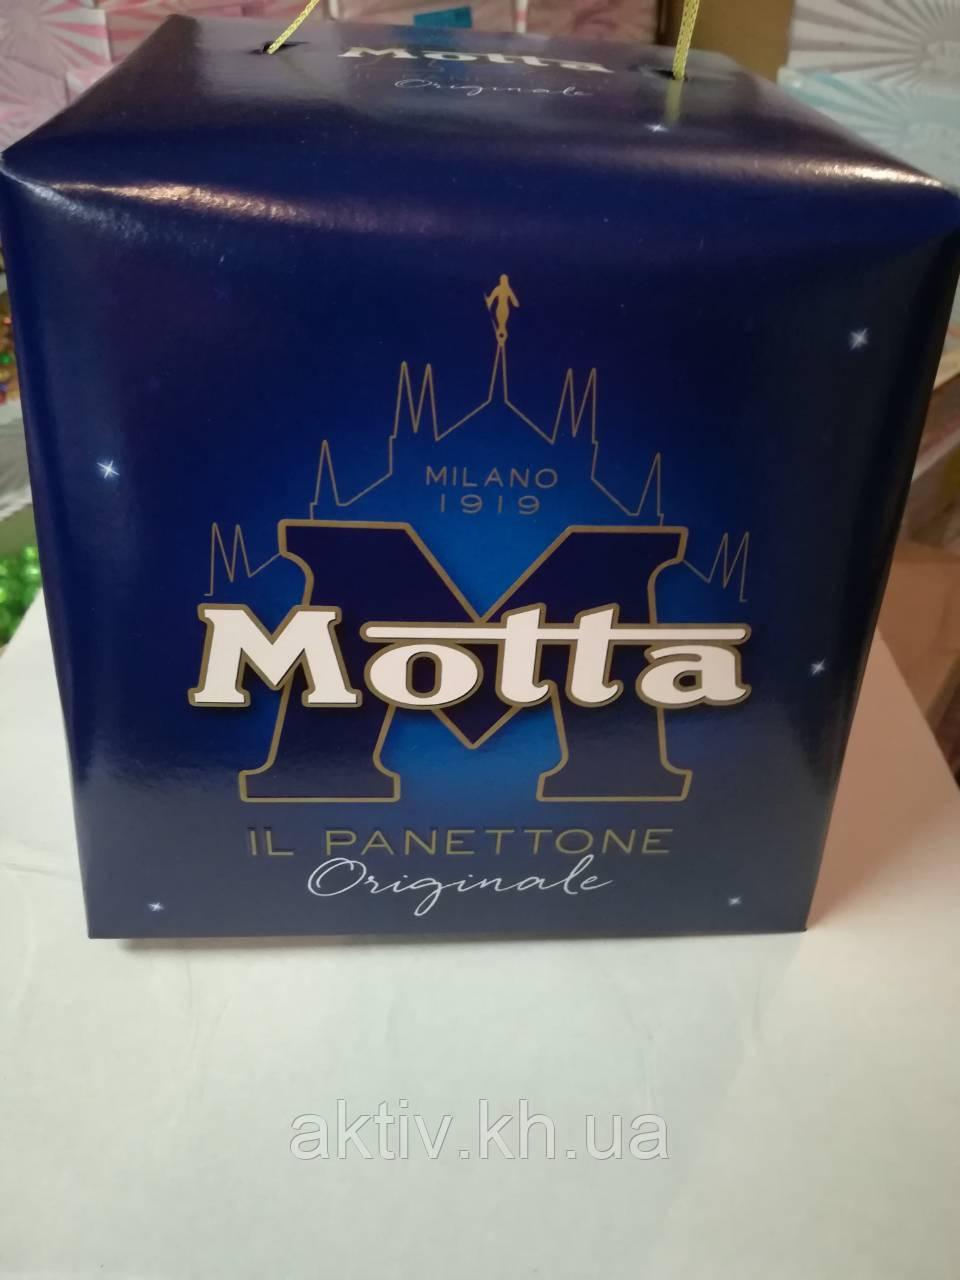 Кекс Motta 750 гр